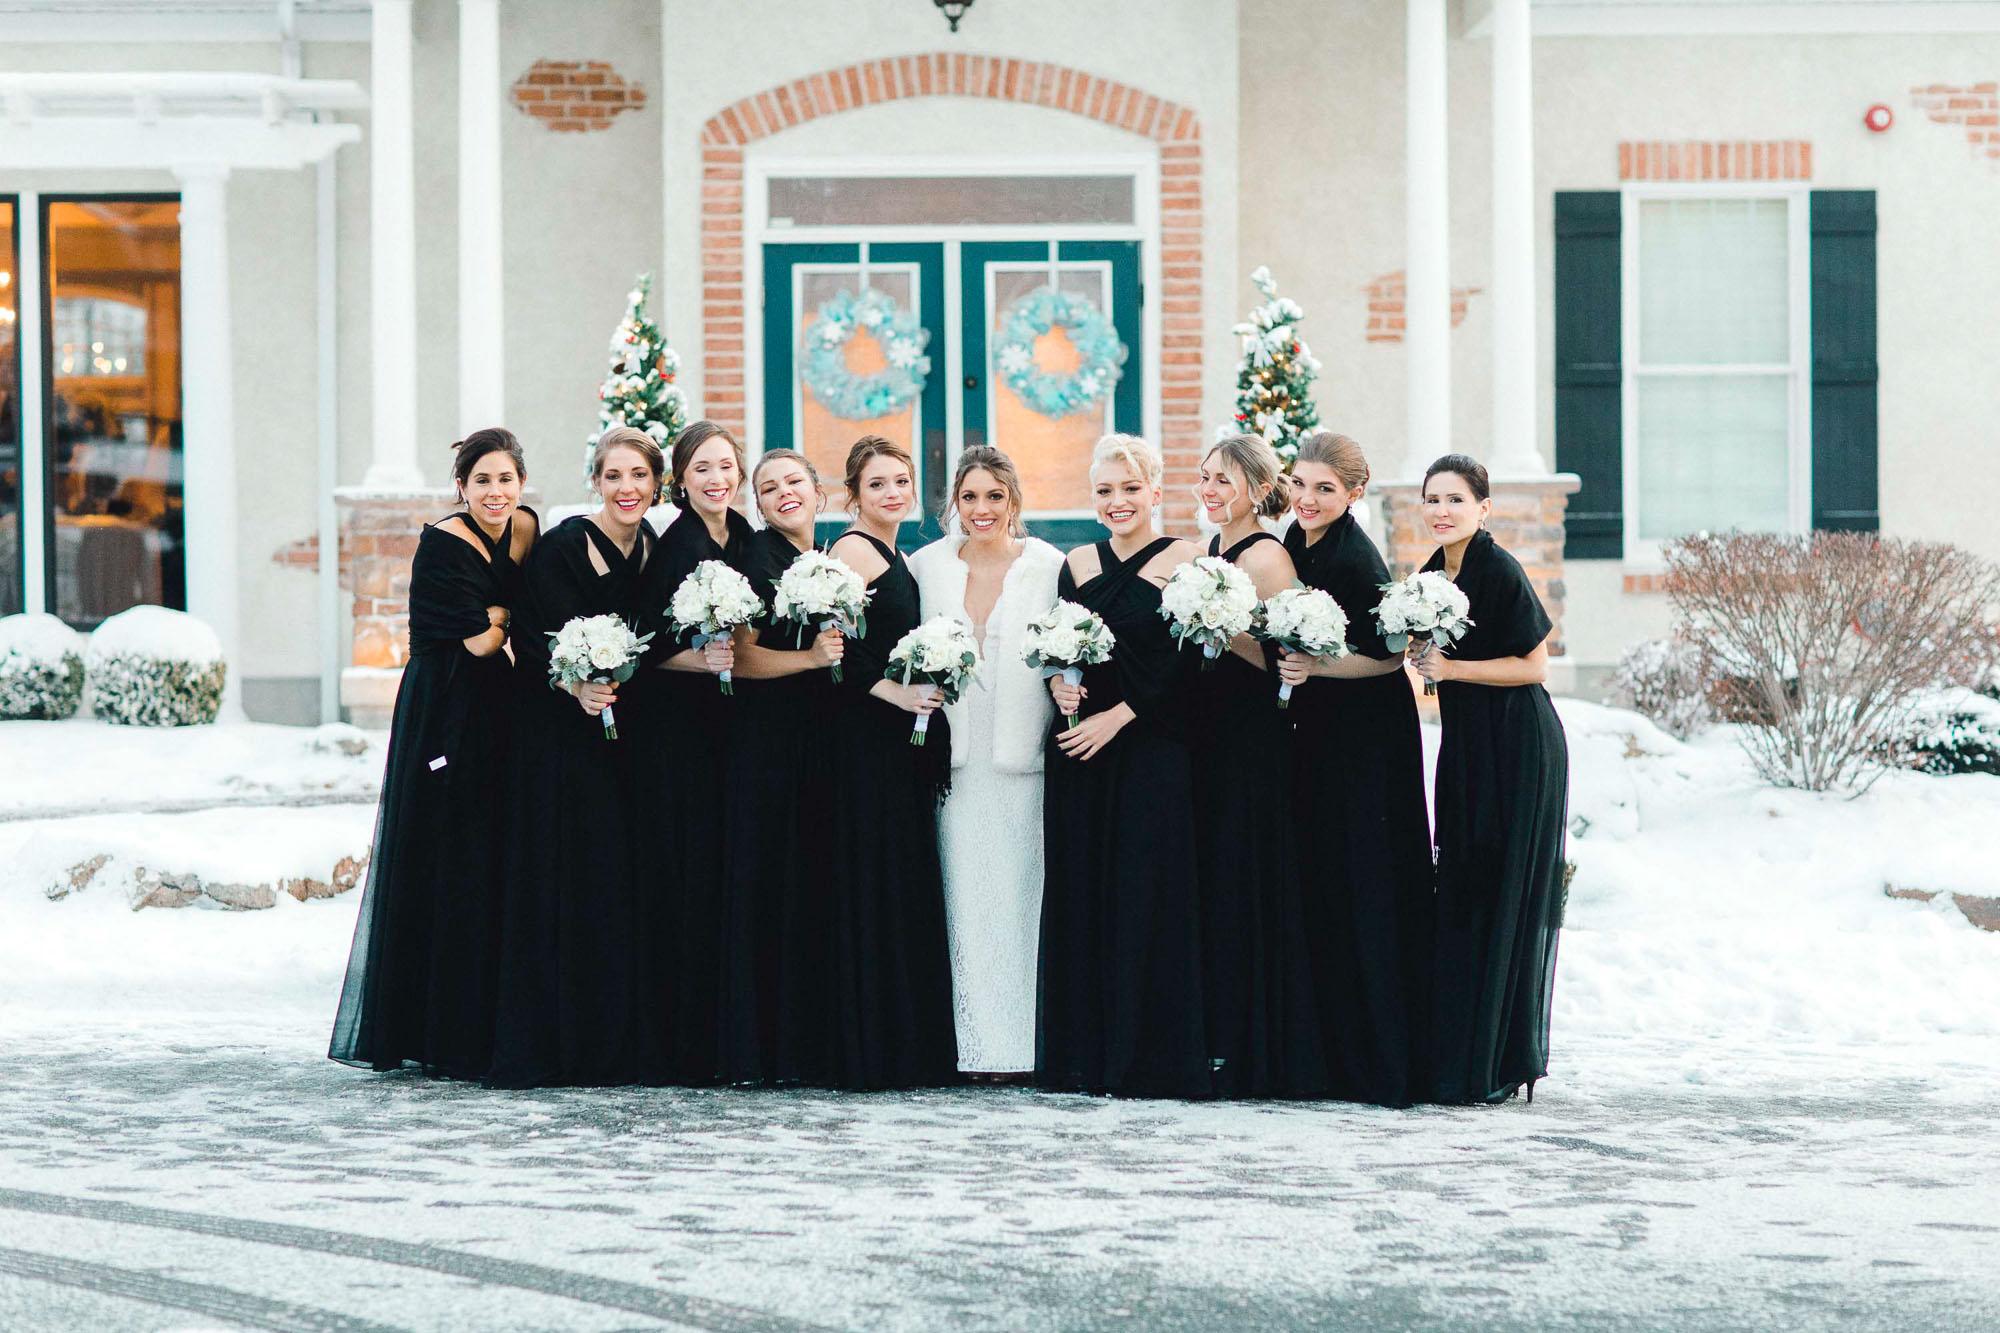 snowy-sand-springs-country-club-drums-pa-christmas-wedding-24945.jpg